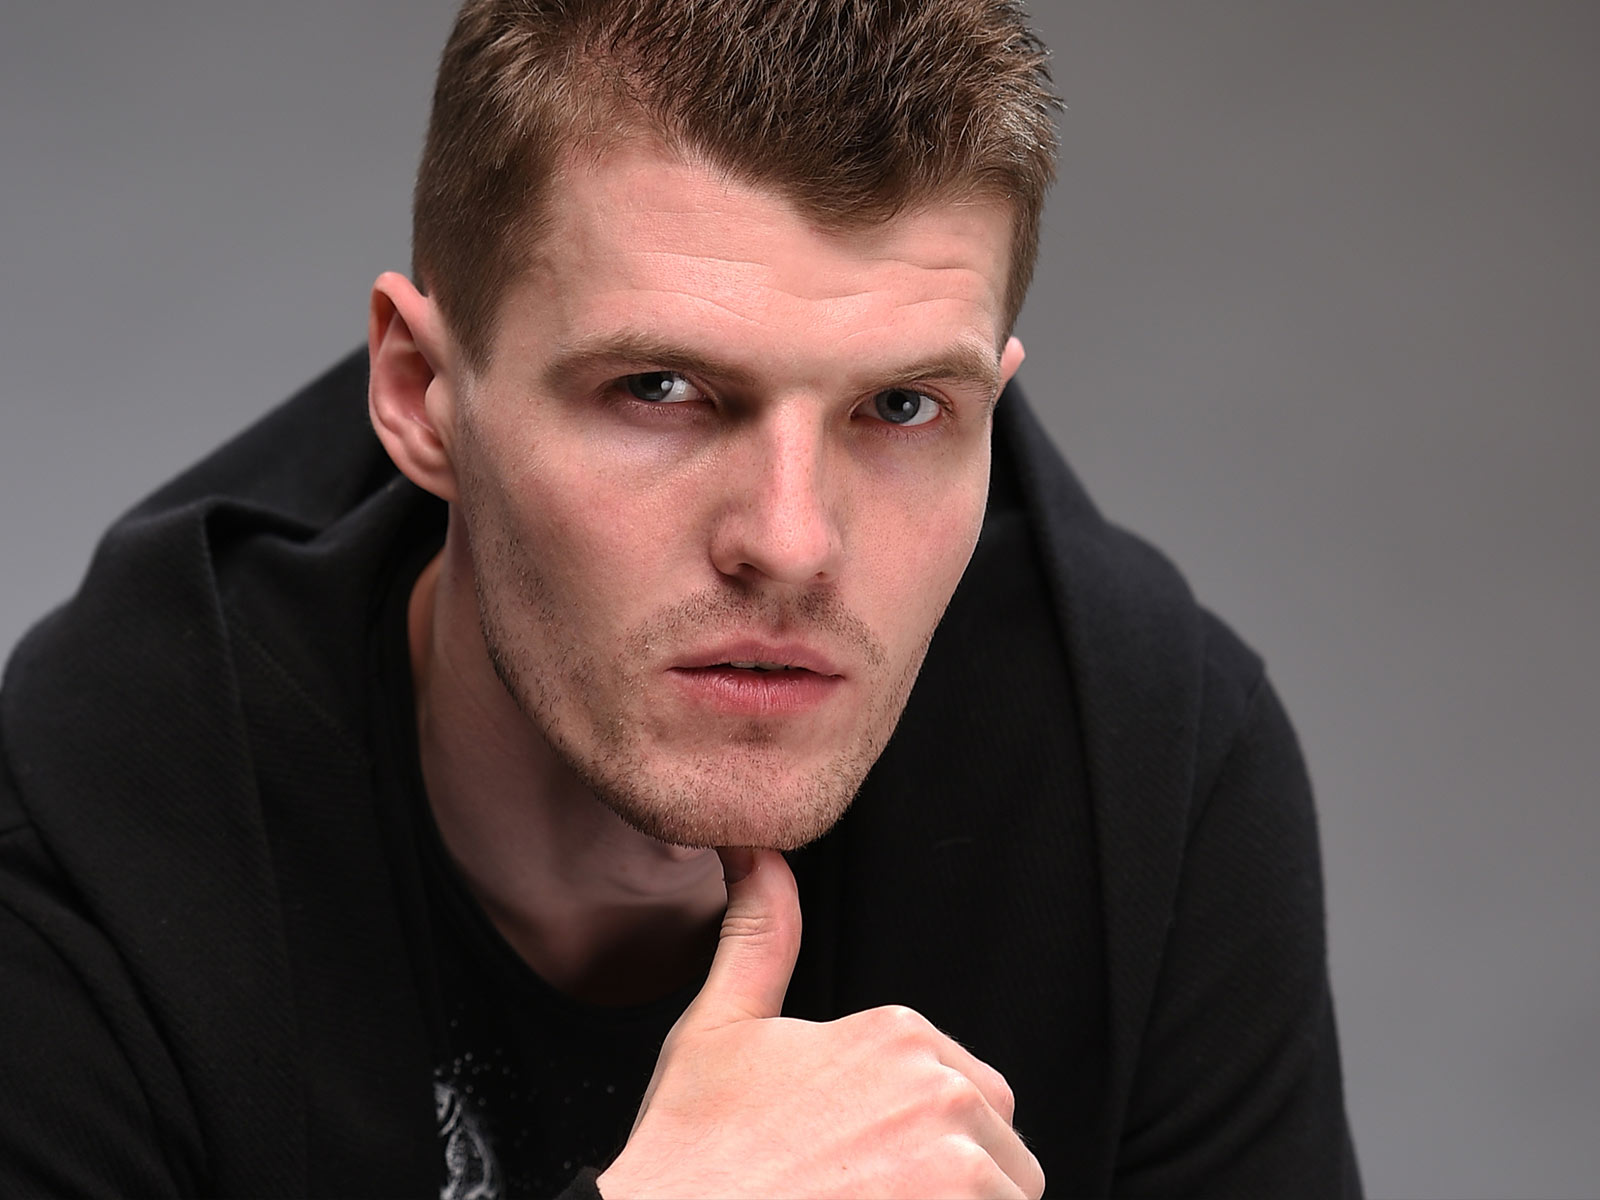 Павел Хараборкин